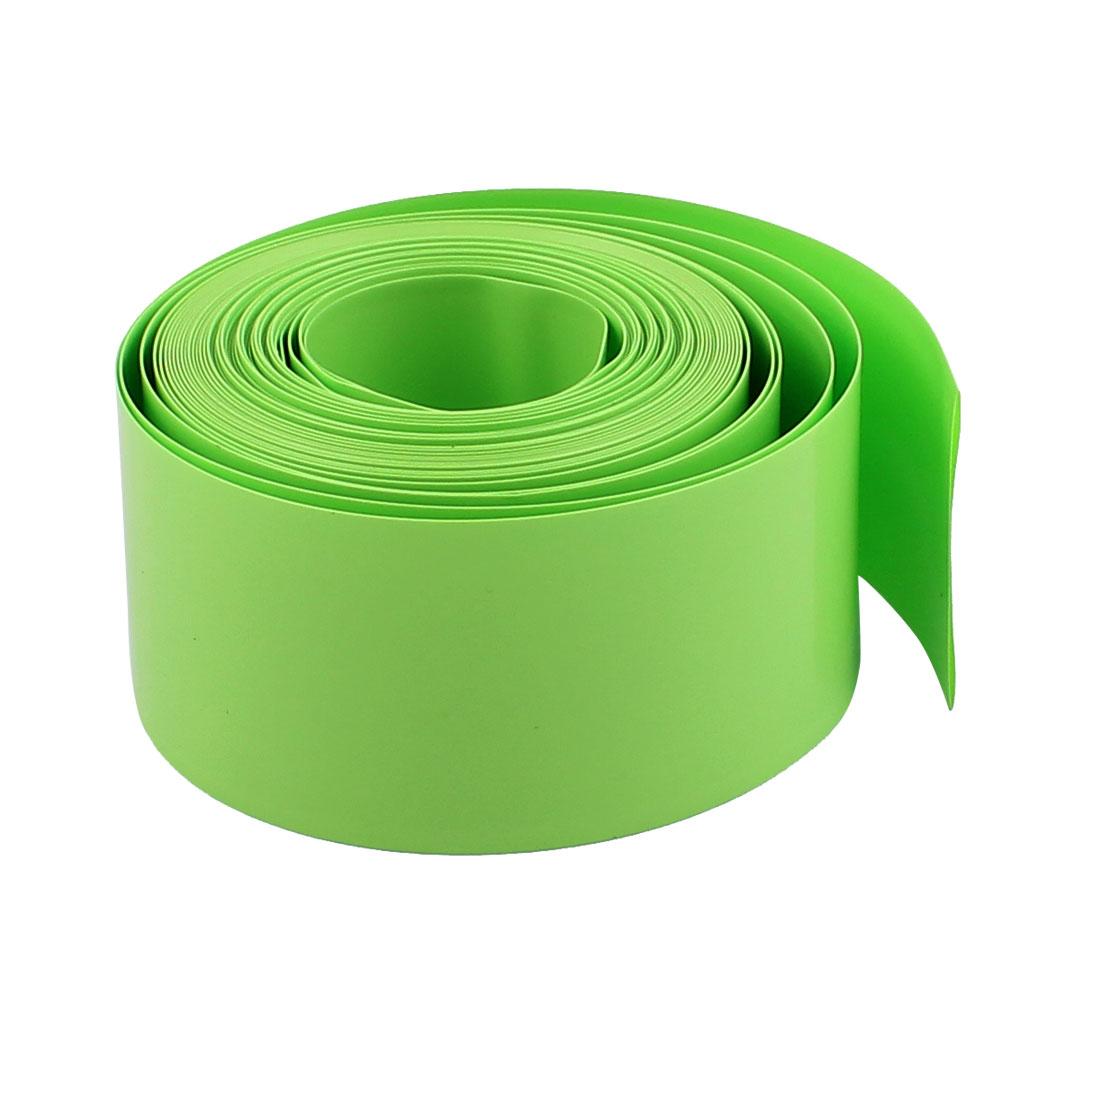 5m x 18.5mm Dia PVC Heat Shrinkable Tube Battery Protective Casing Green